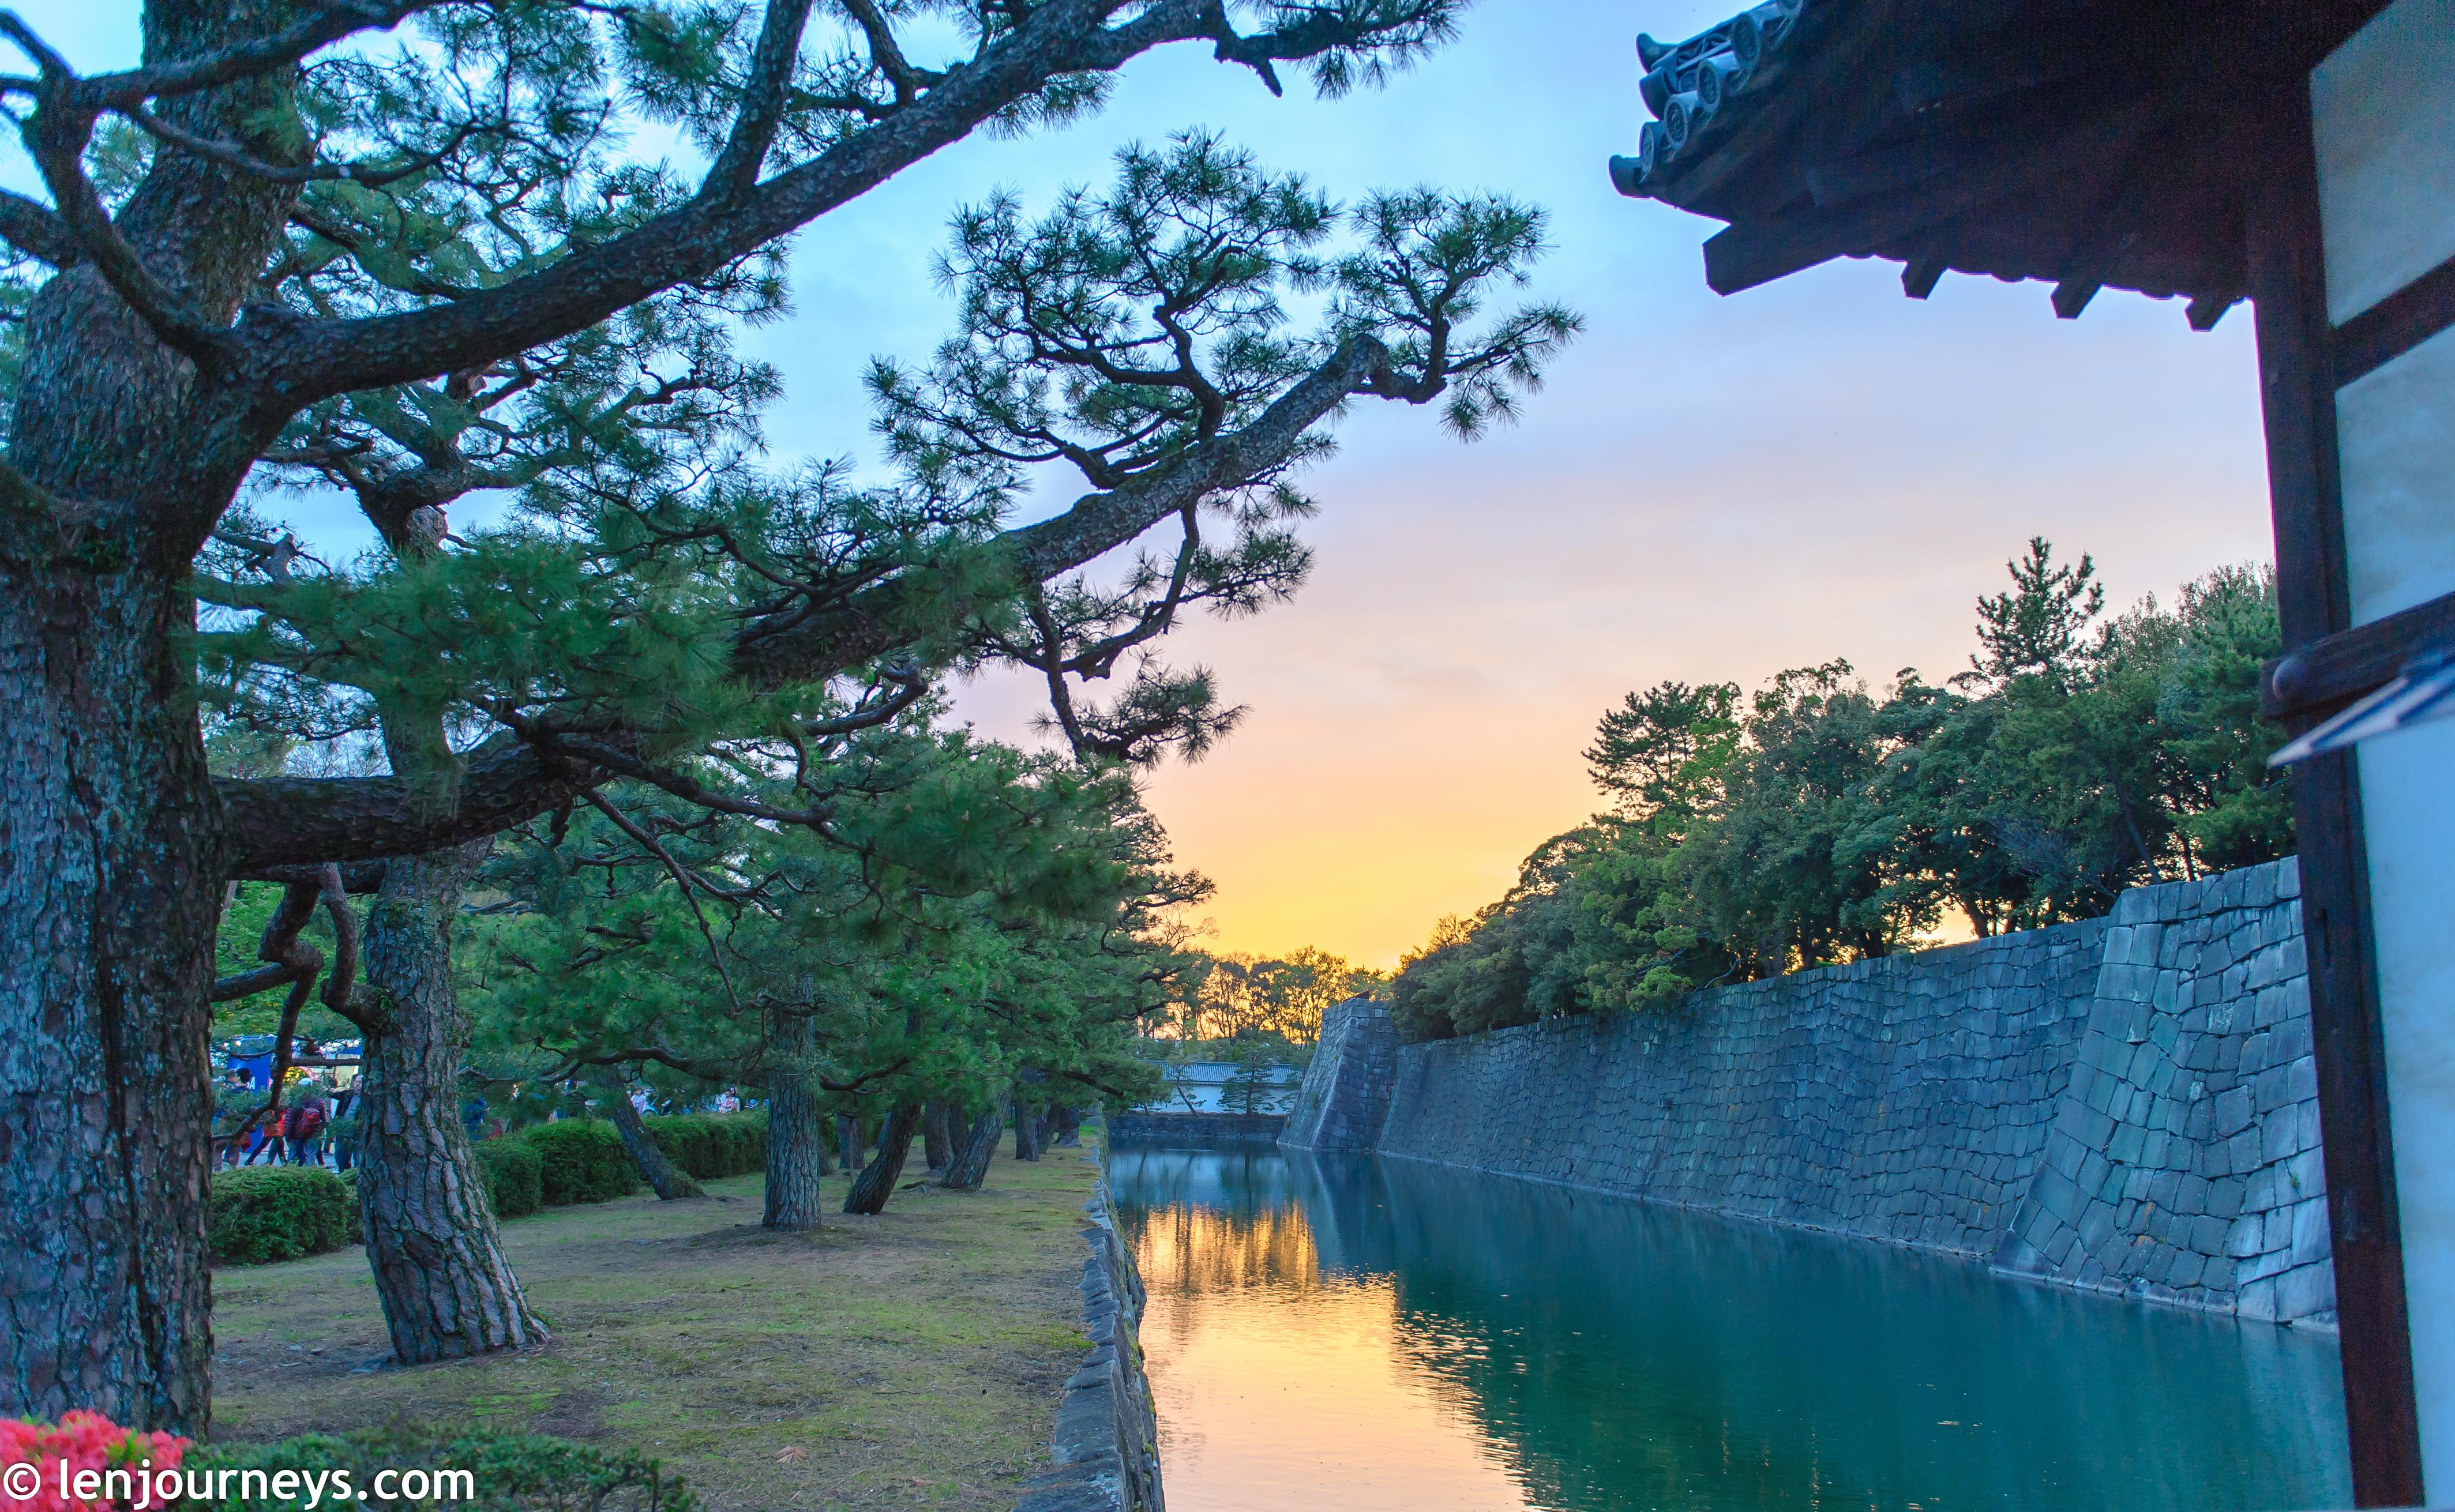 Honmaru - Main circle of defence